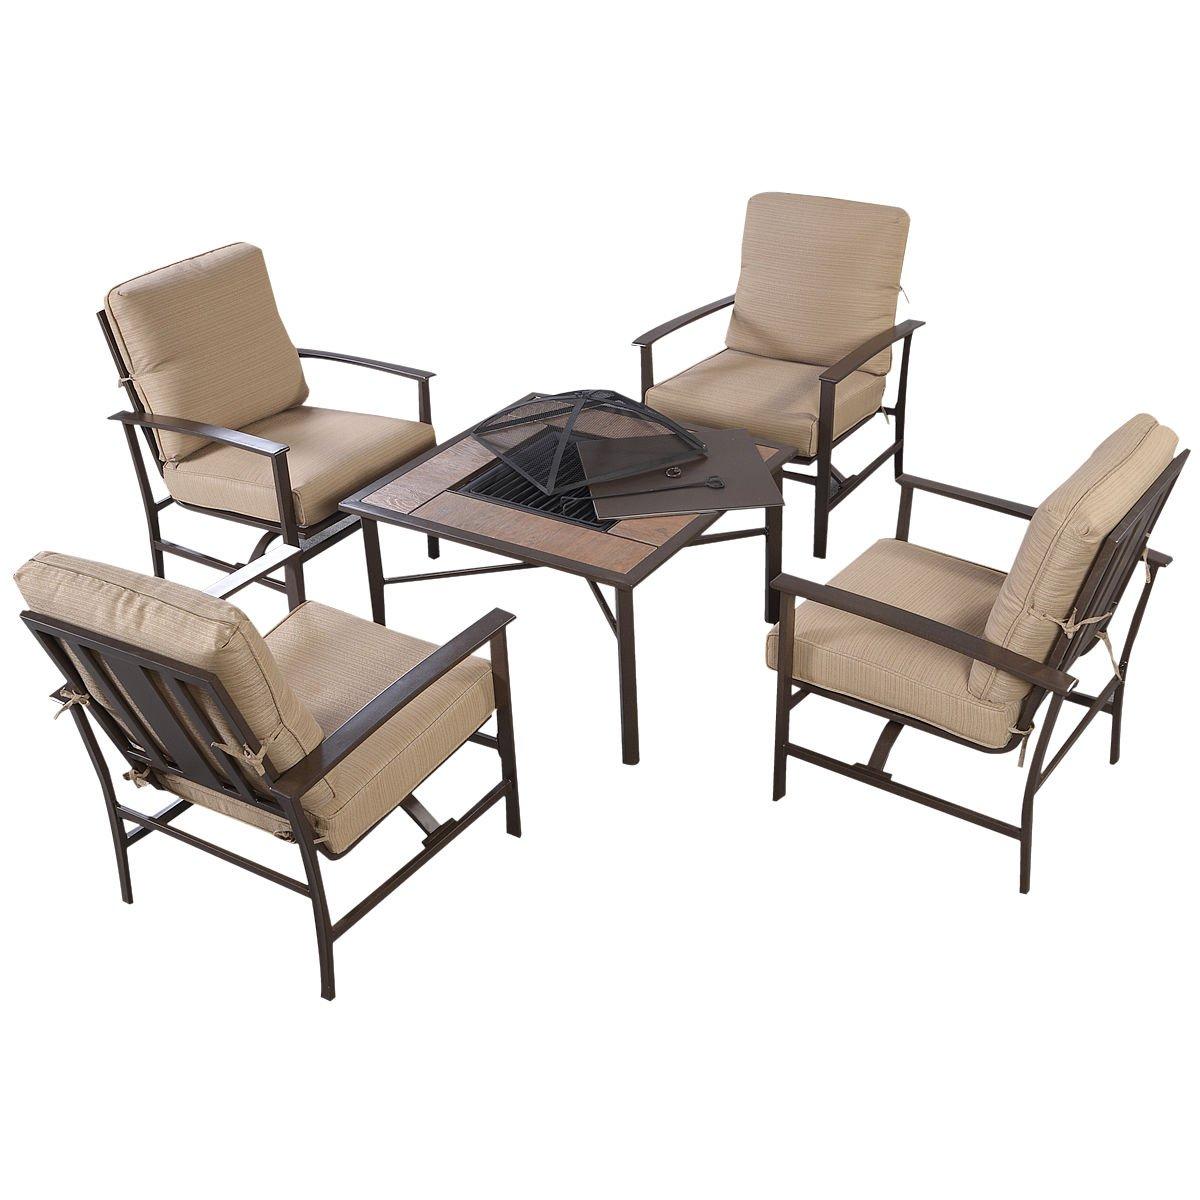 Amazon.com: GHP Outdoor Patio 5 Piece Chair U0026 BBQ Stove Fire Pit Table  Furniture Set W Umbrella: Garden U0026 Outdoor